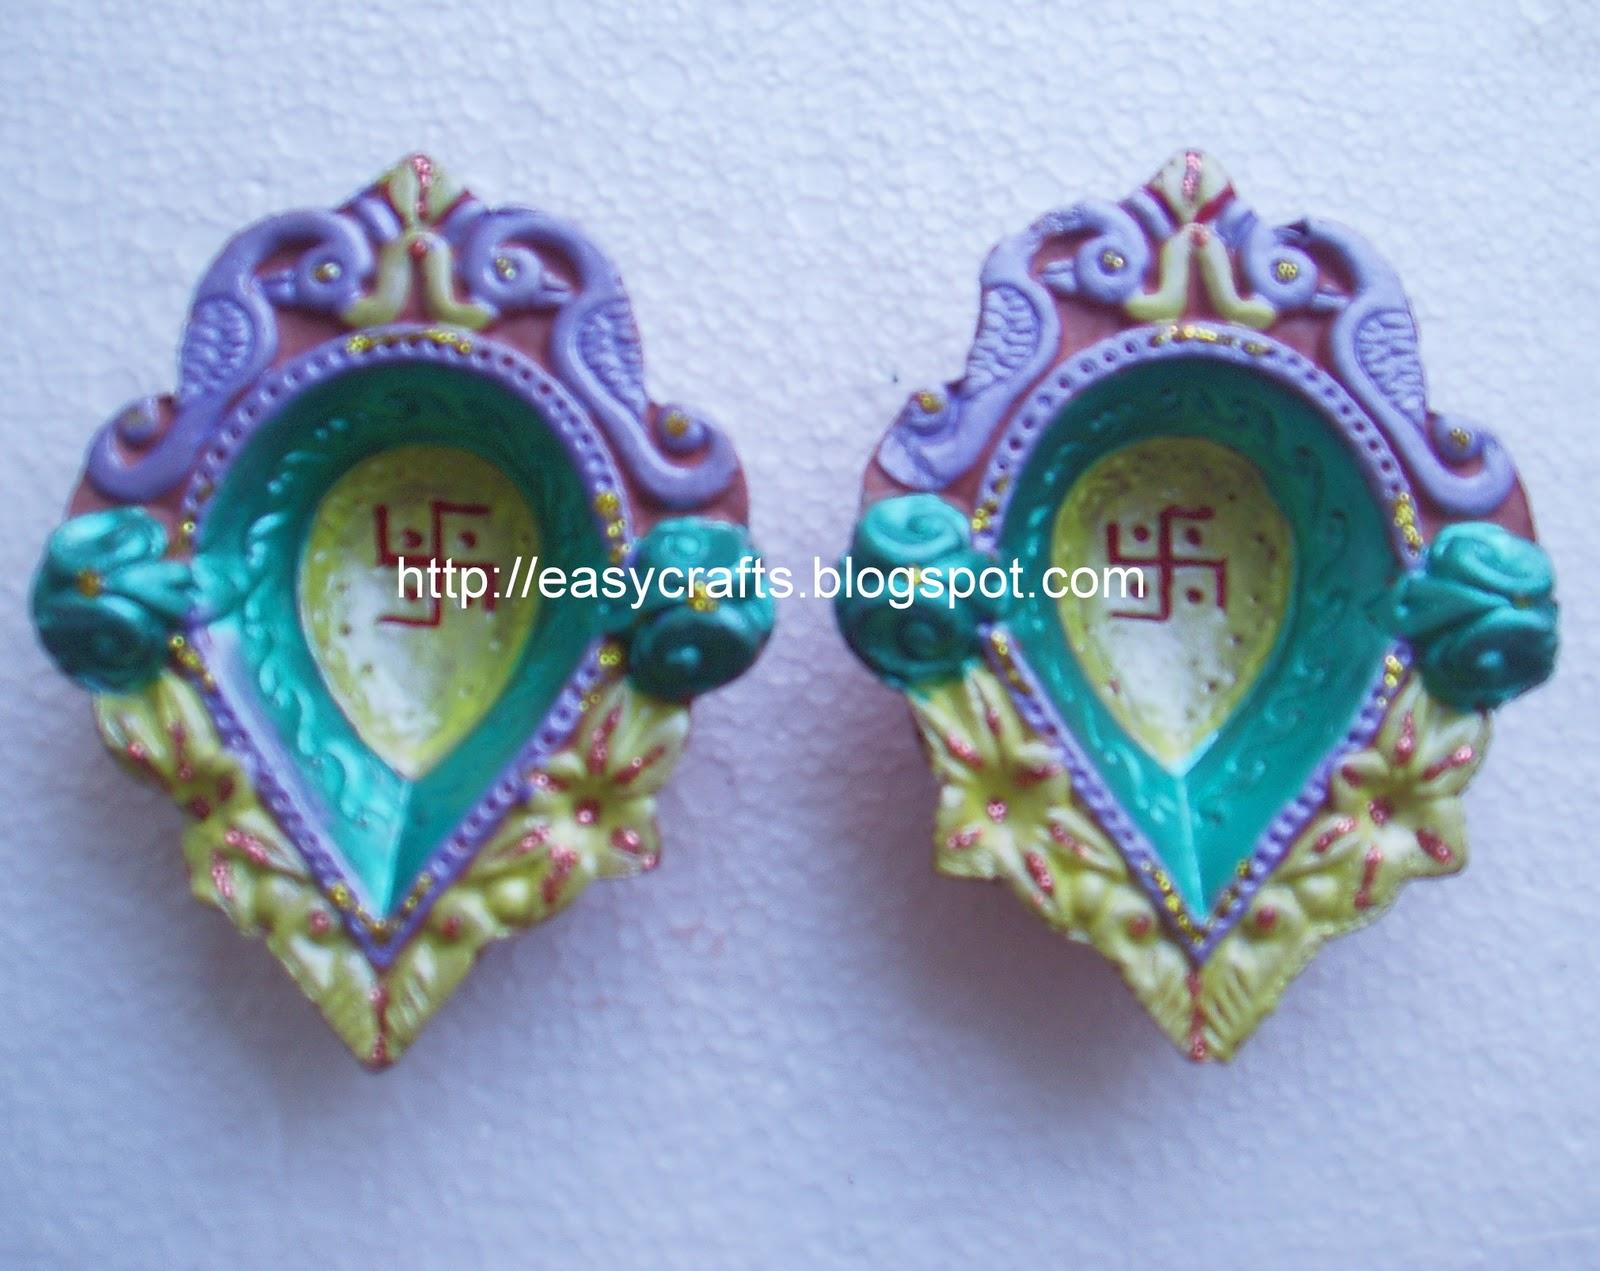 Easy crafts explore your creativity december 2010 for Arathi thattu decoration